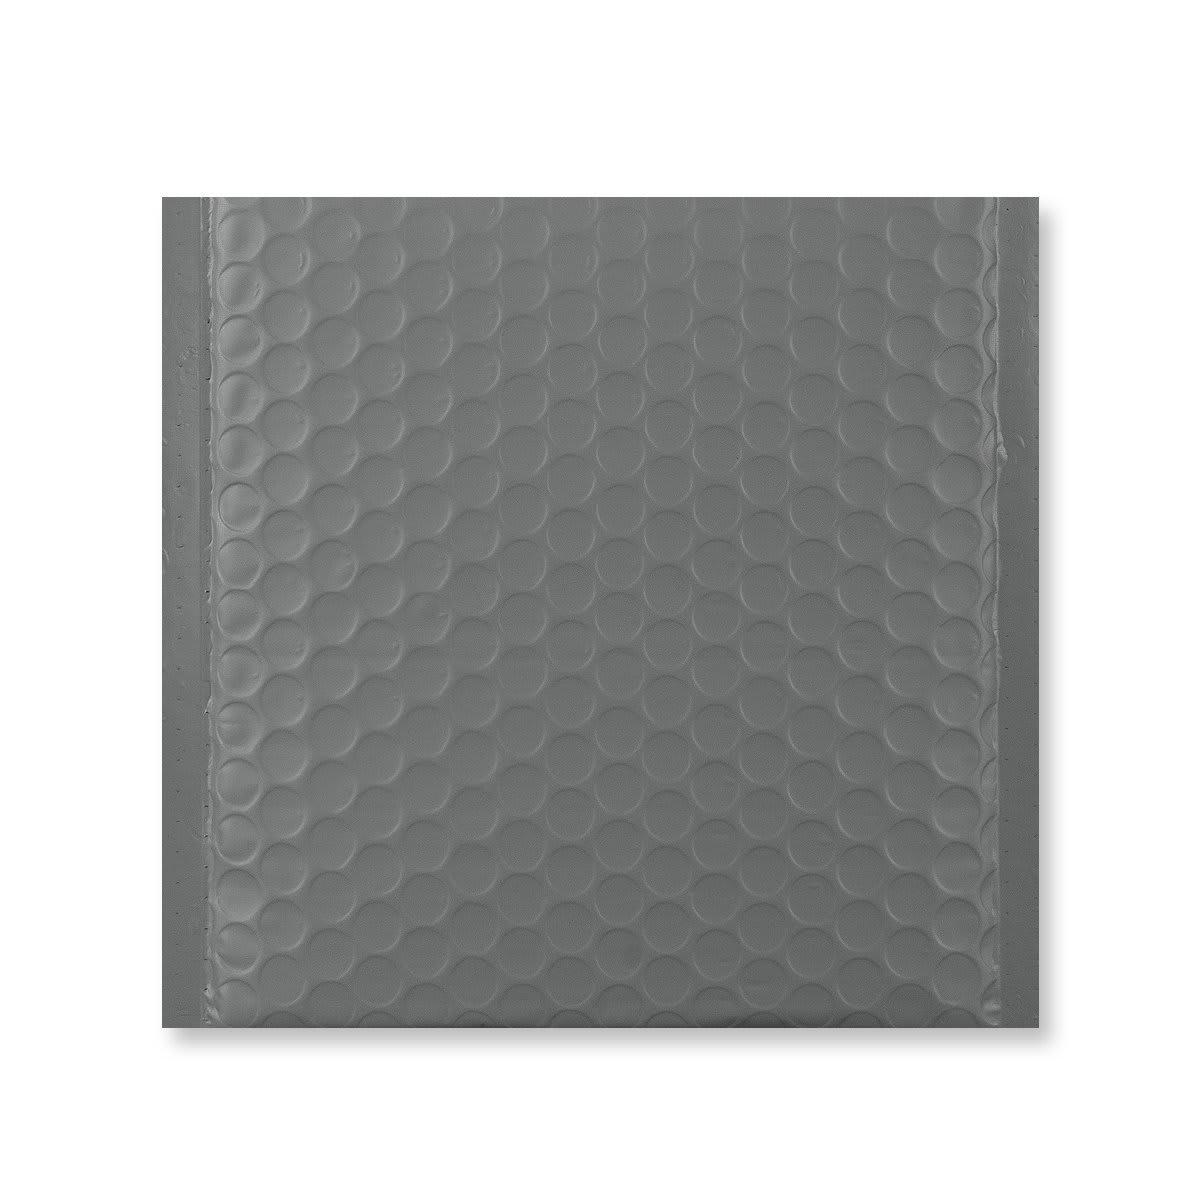 165x165mm DARK GREY MATT METALLIC BUBBLE BAGS